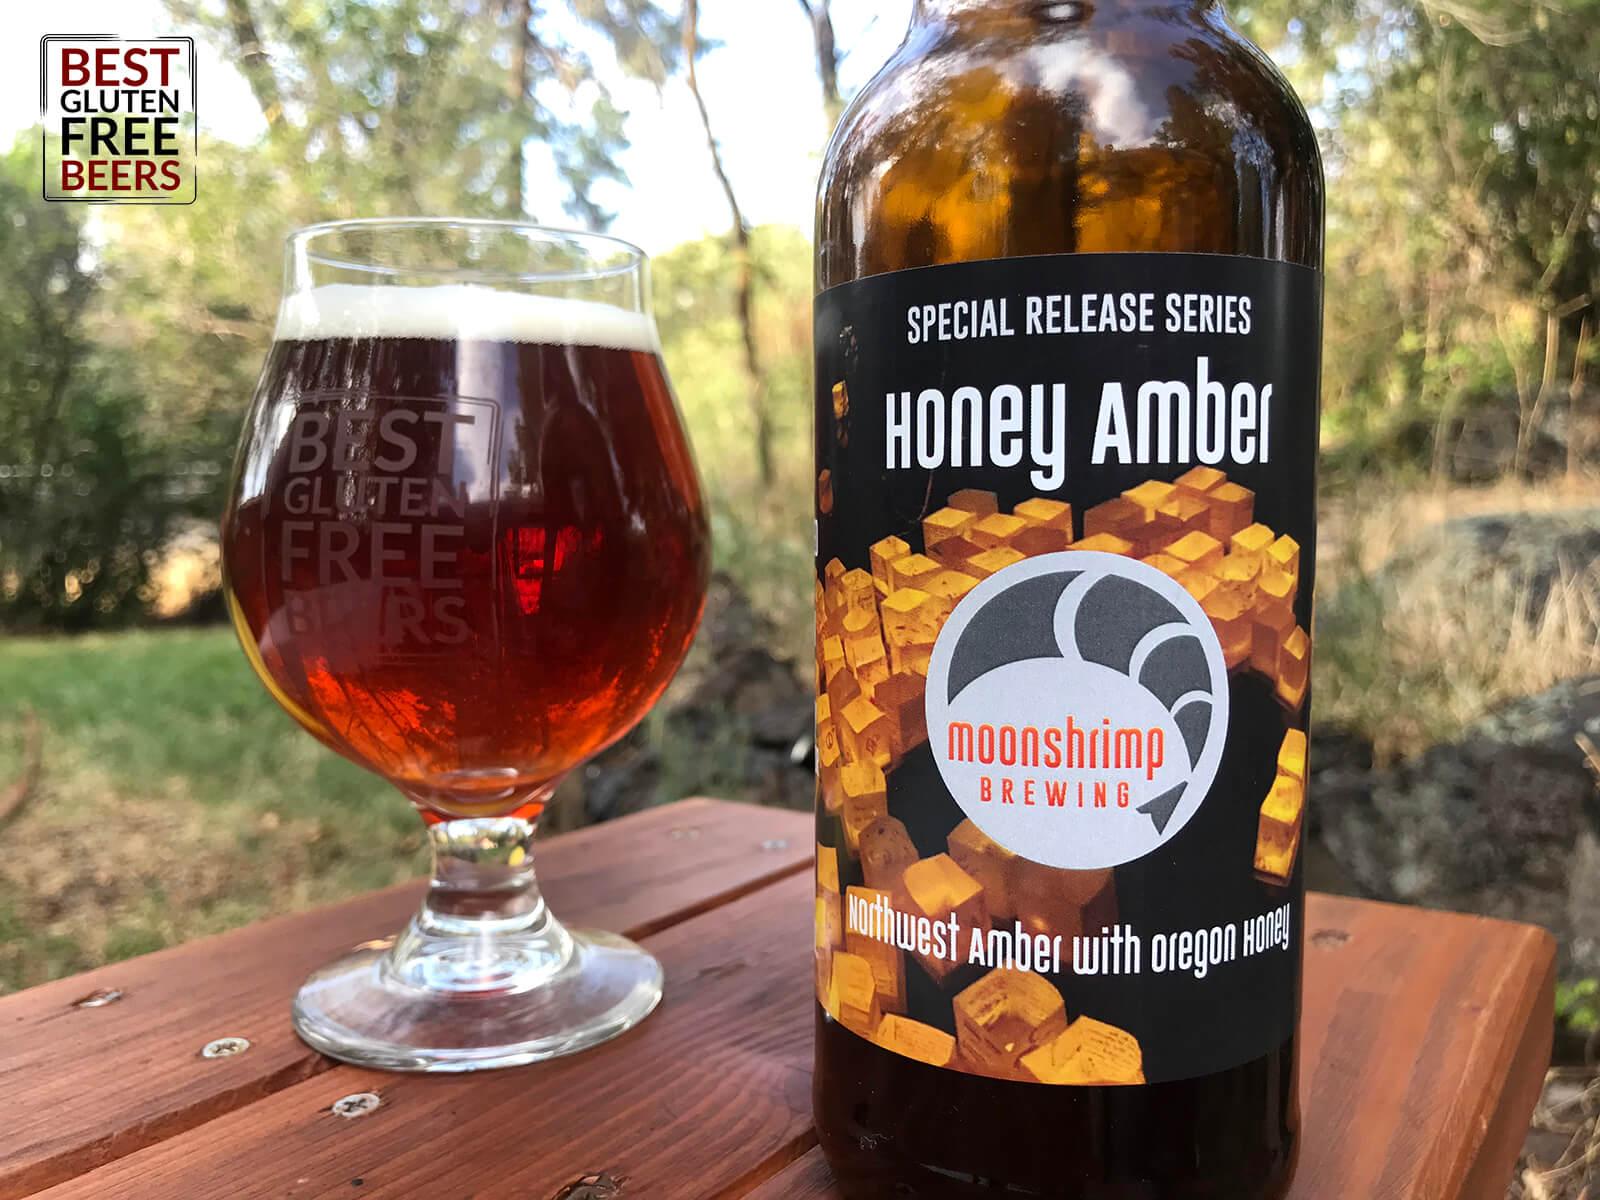 Moonshrimp Brewing Honey Amber Ale 3